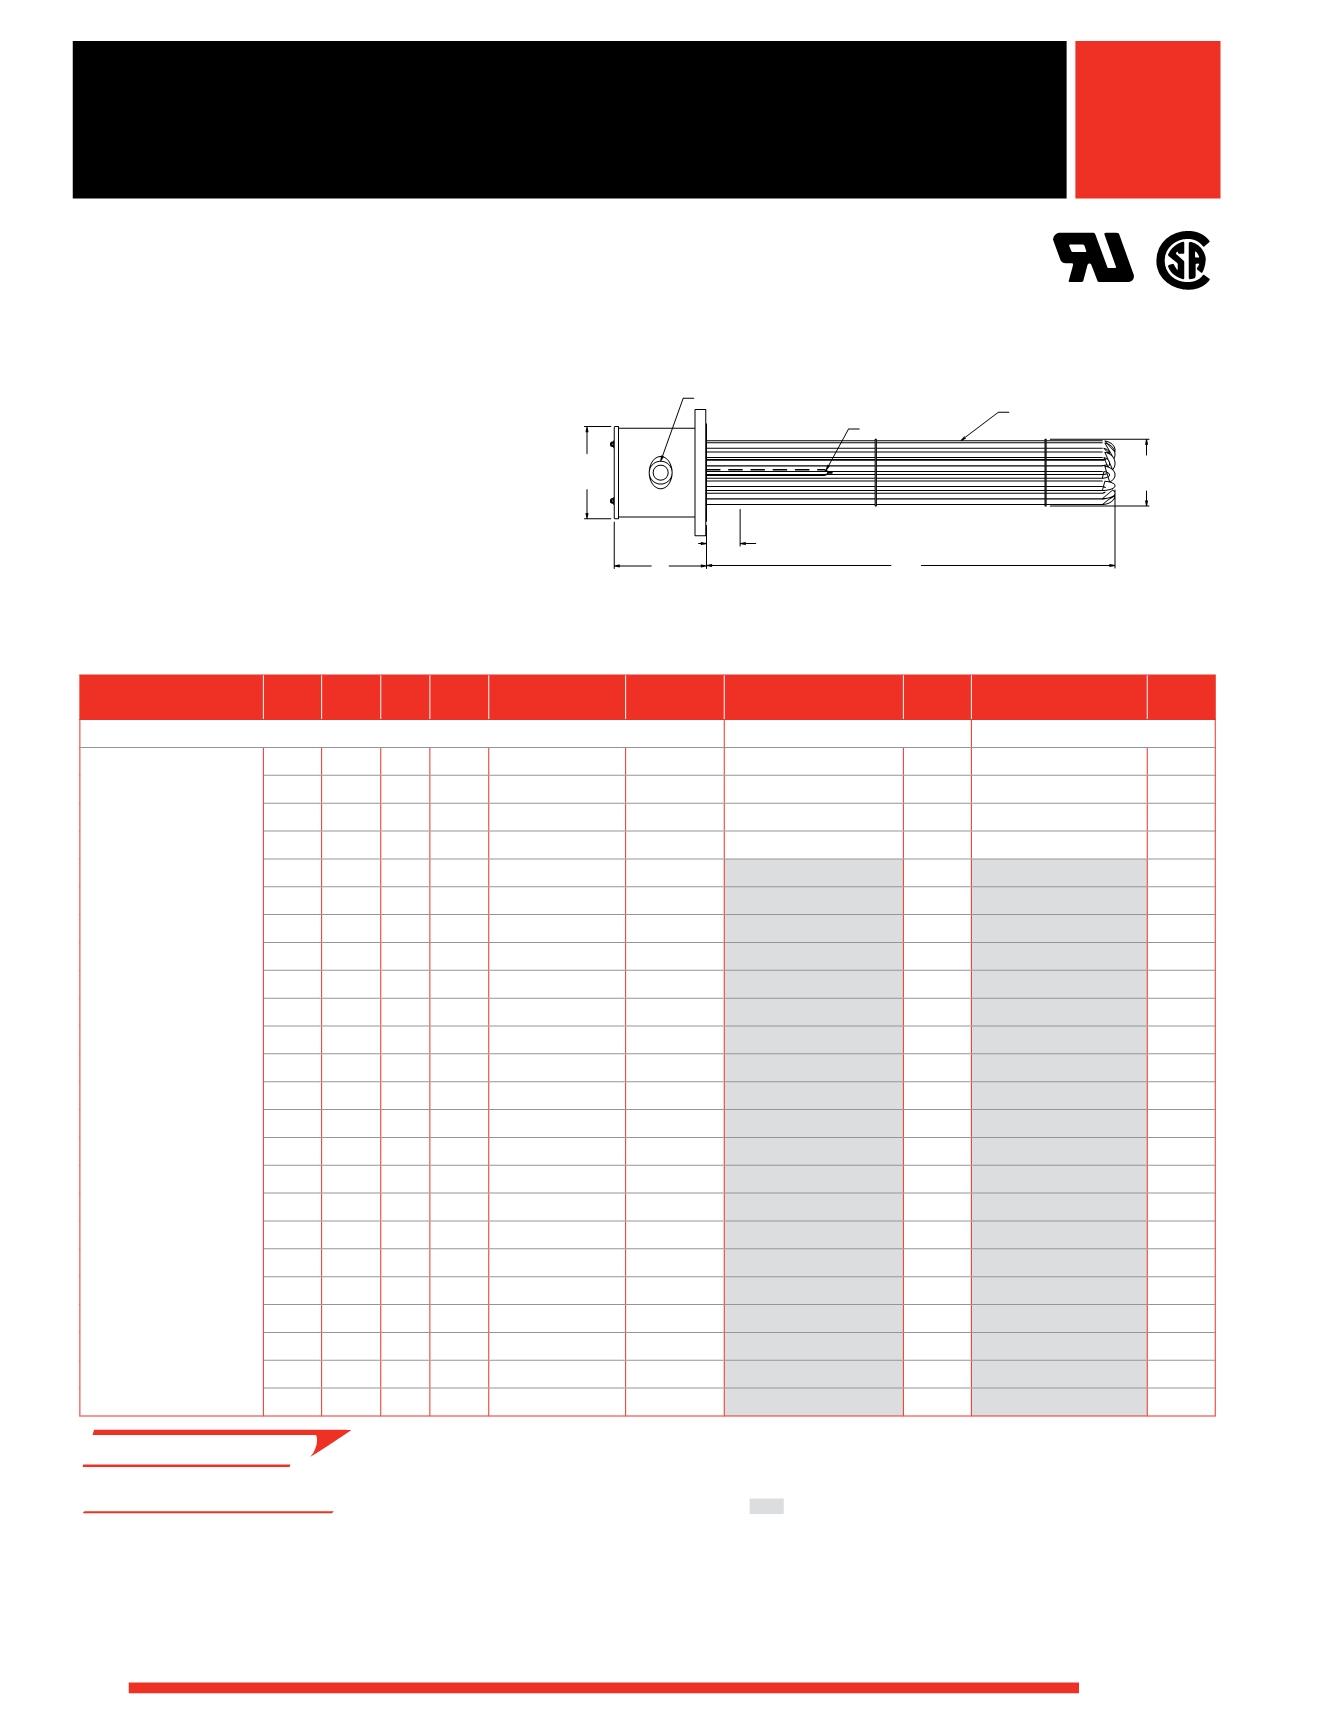 watlow heater wiring diagram Download-Watlow Heating Solutions page 258 3-s